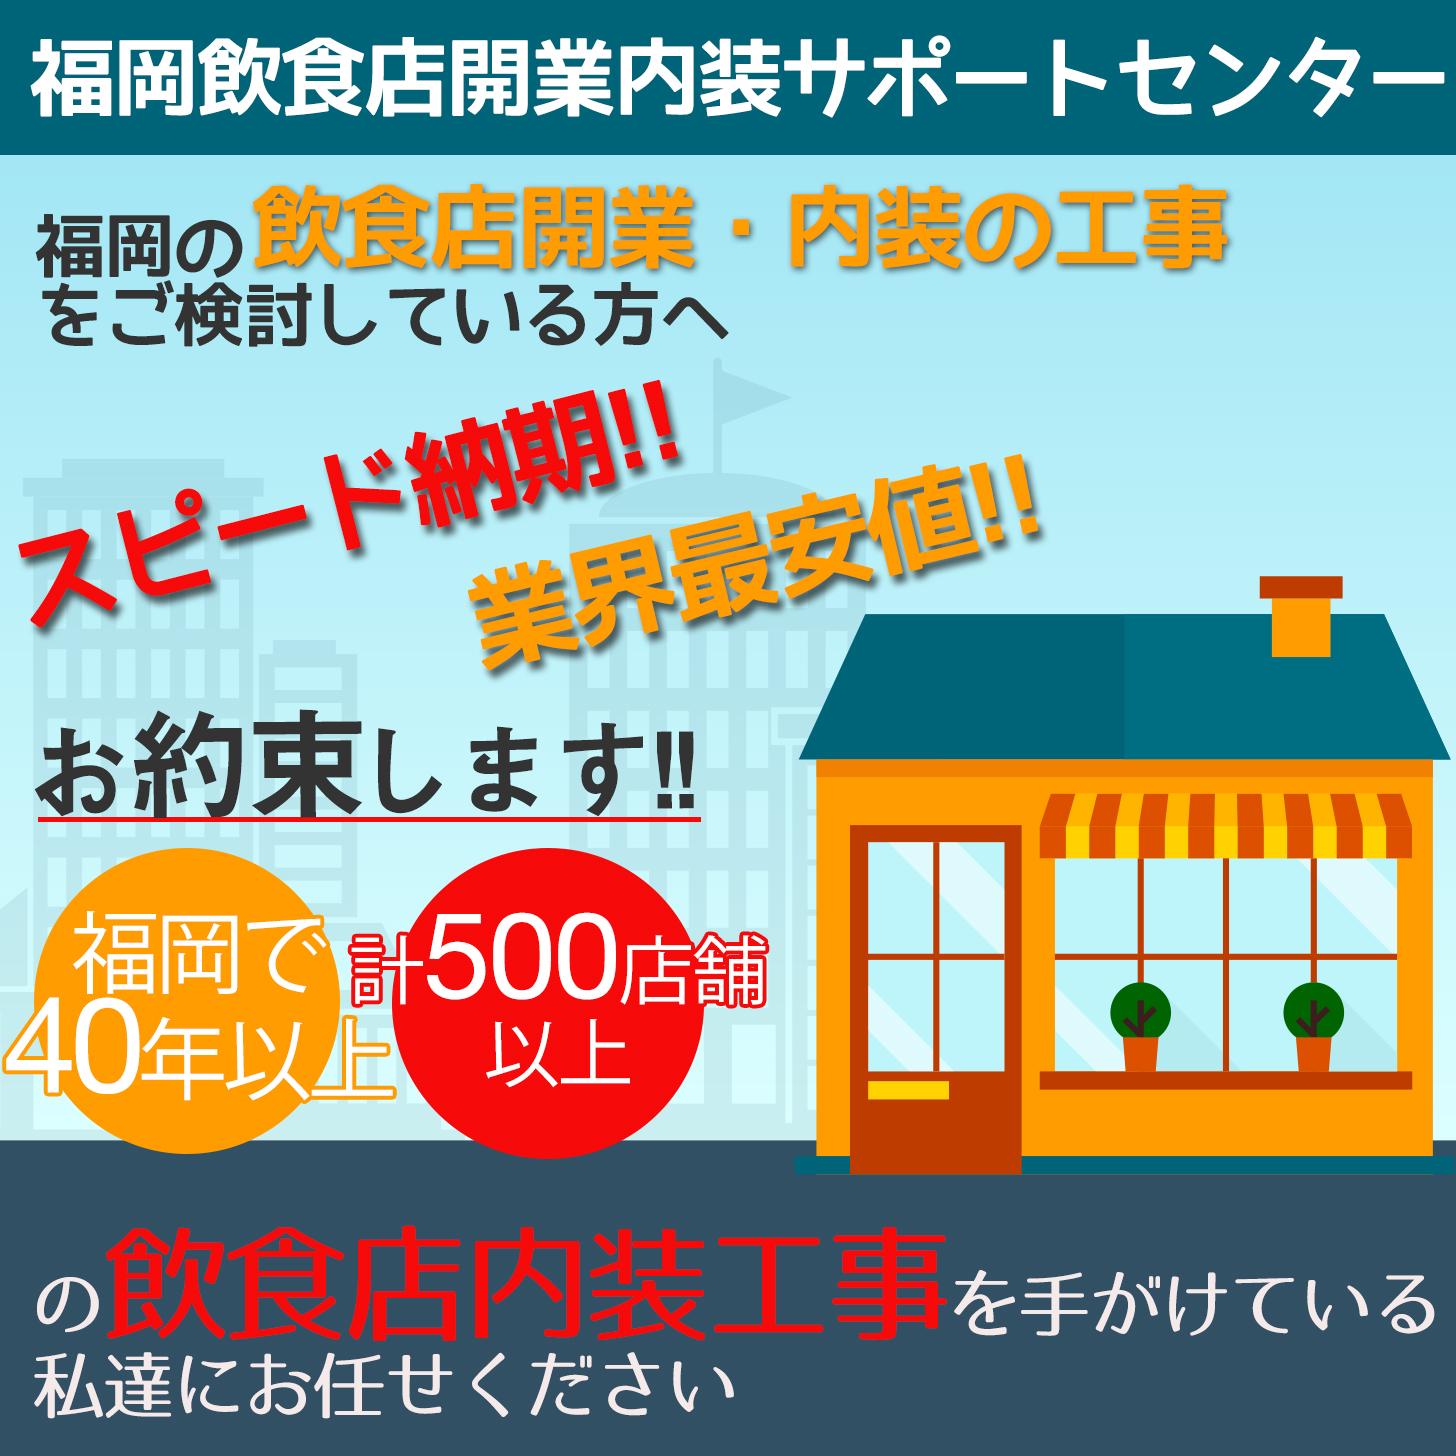 福岡飲食店内装開業センター